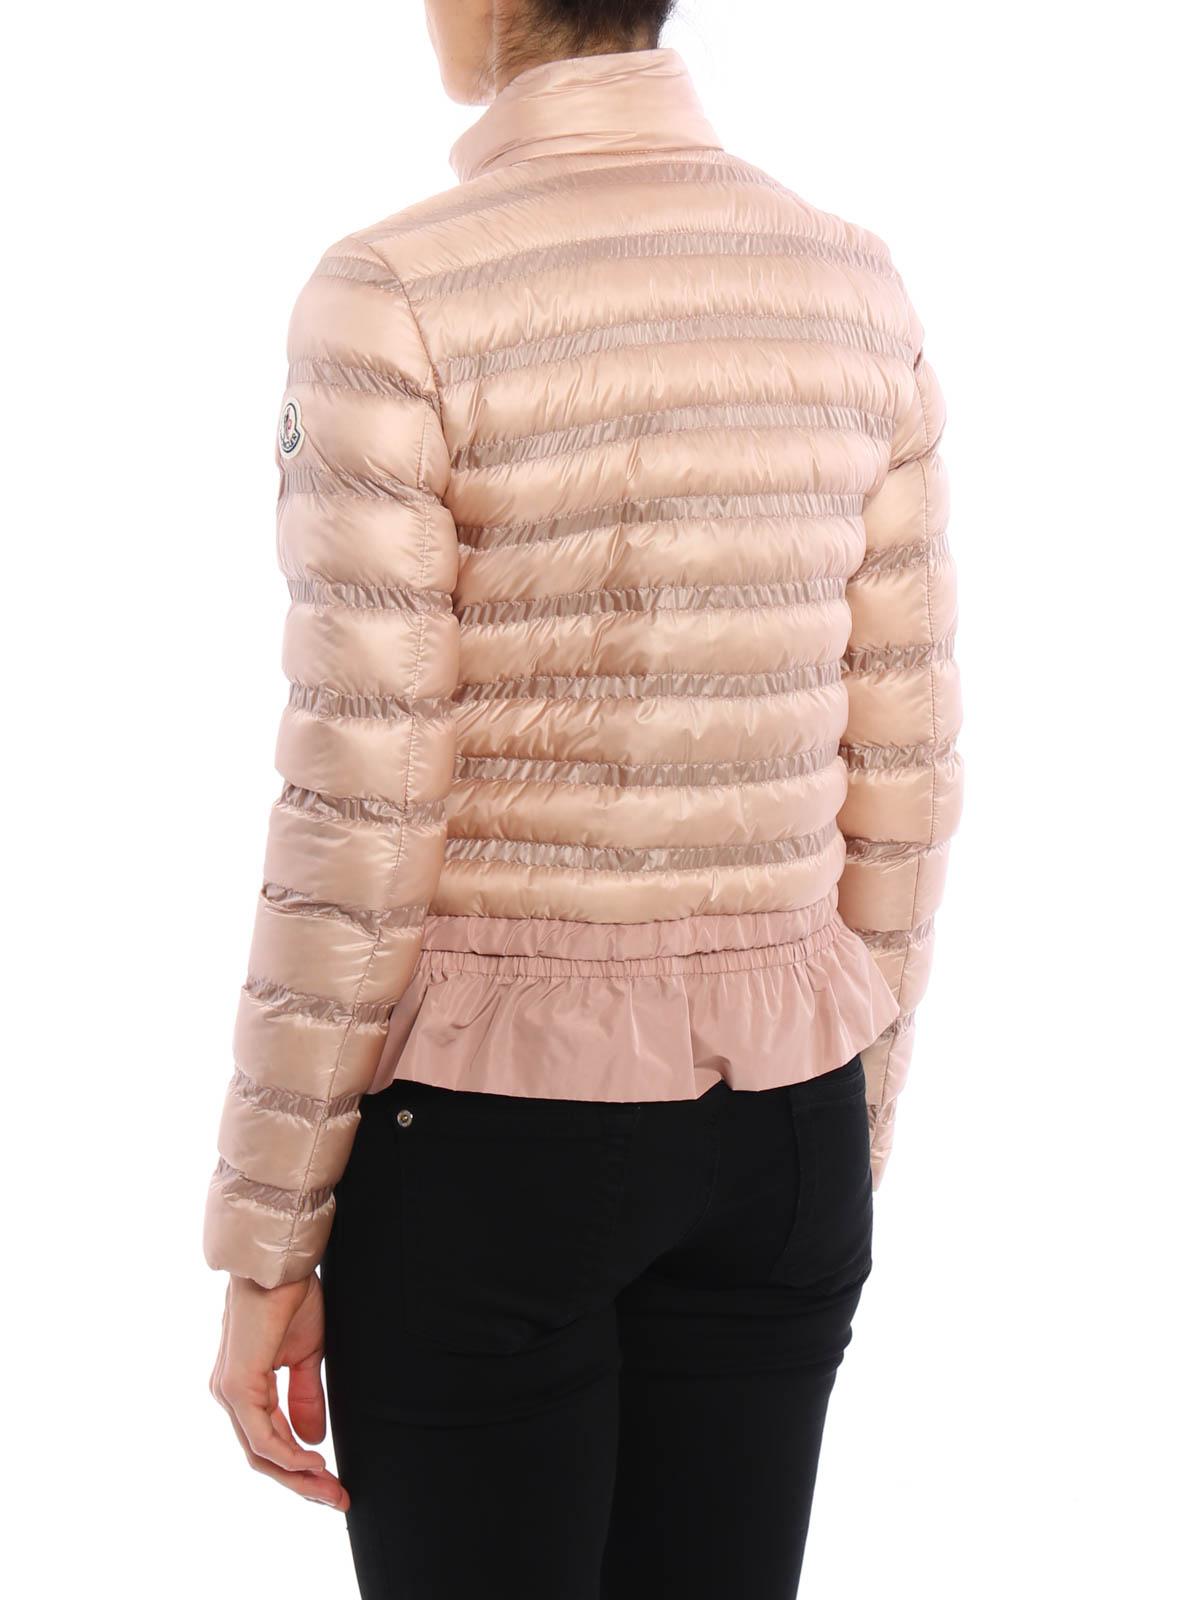 093 leggero Anemone Moncler giacche C1 imbottite Piumino E5HxxwpY